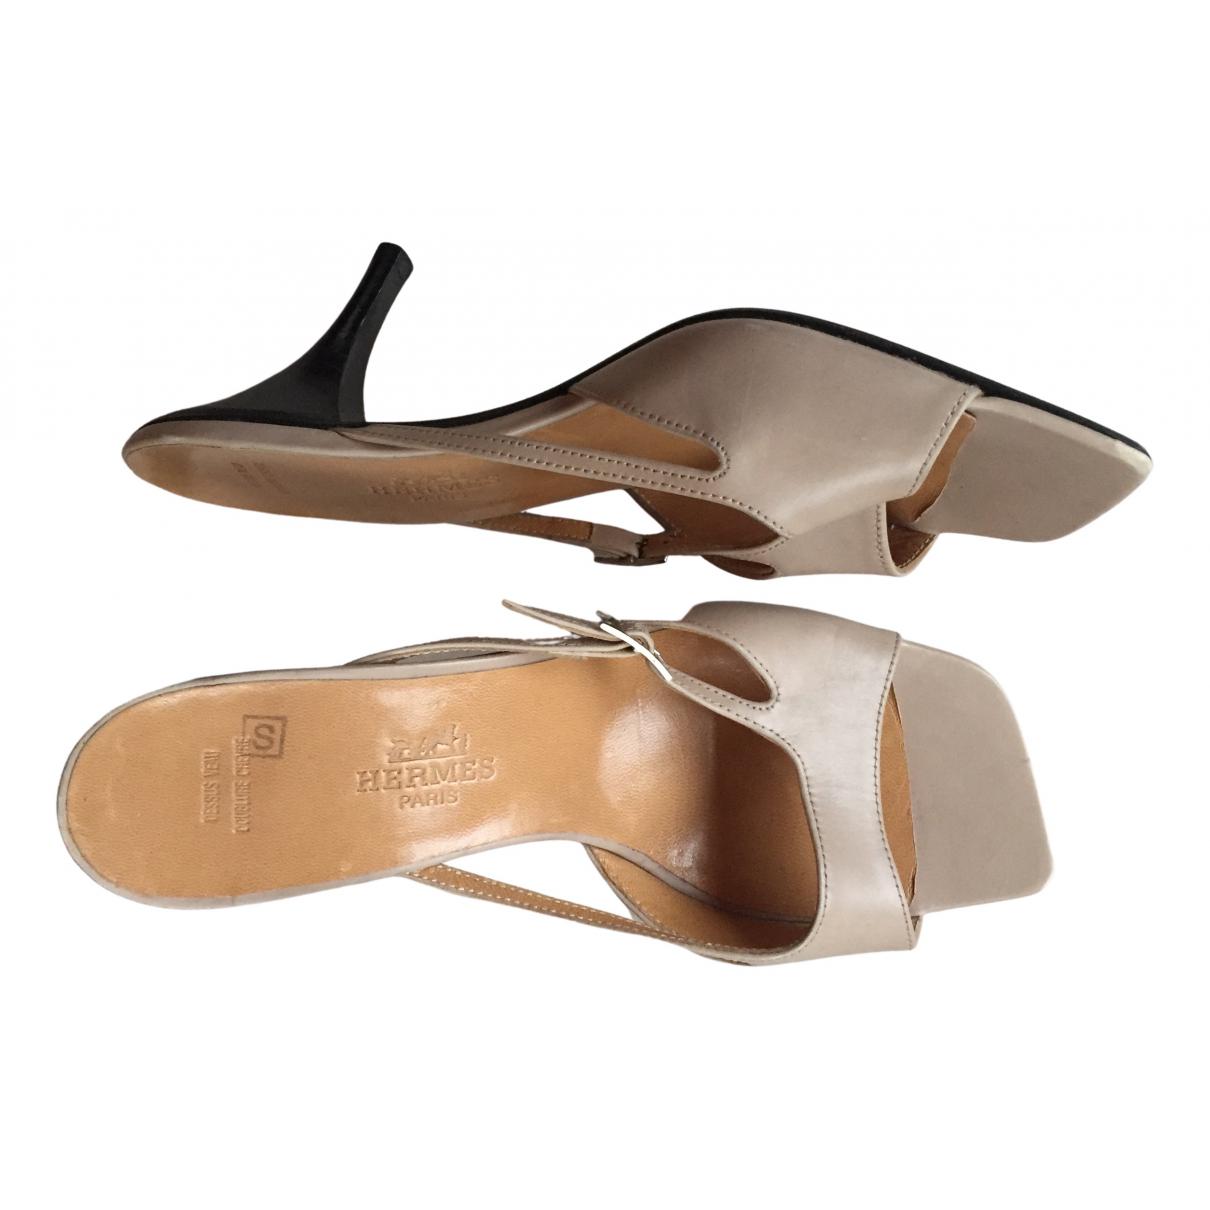 Hermès \N Beige Leather Sandals for Women 36.5 EU